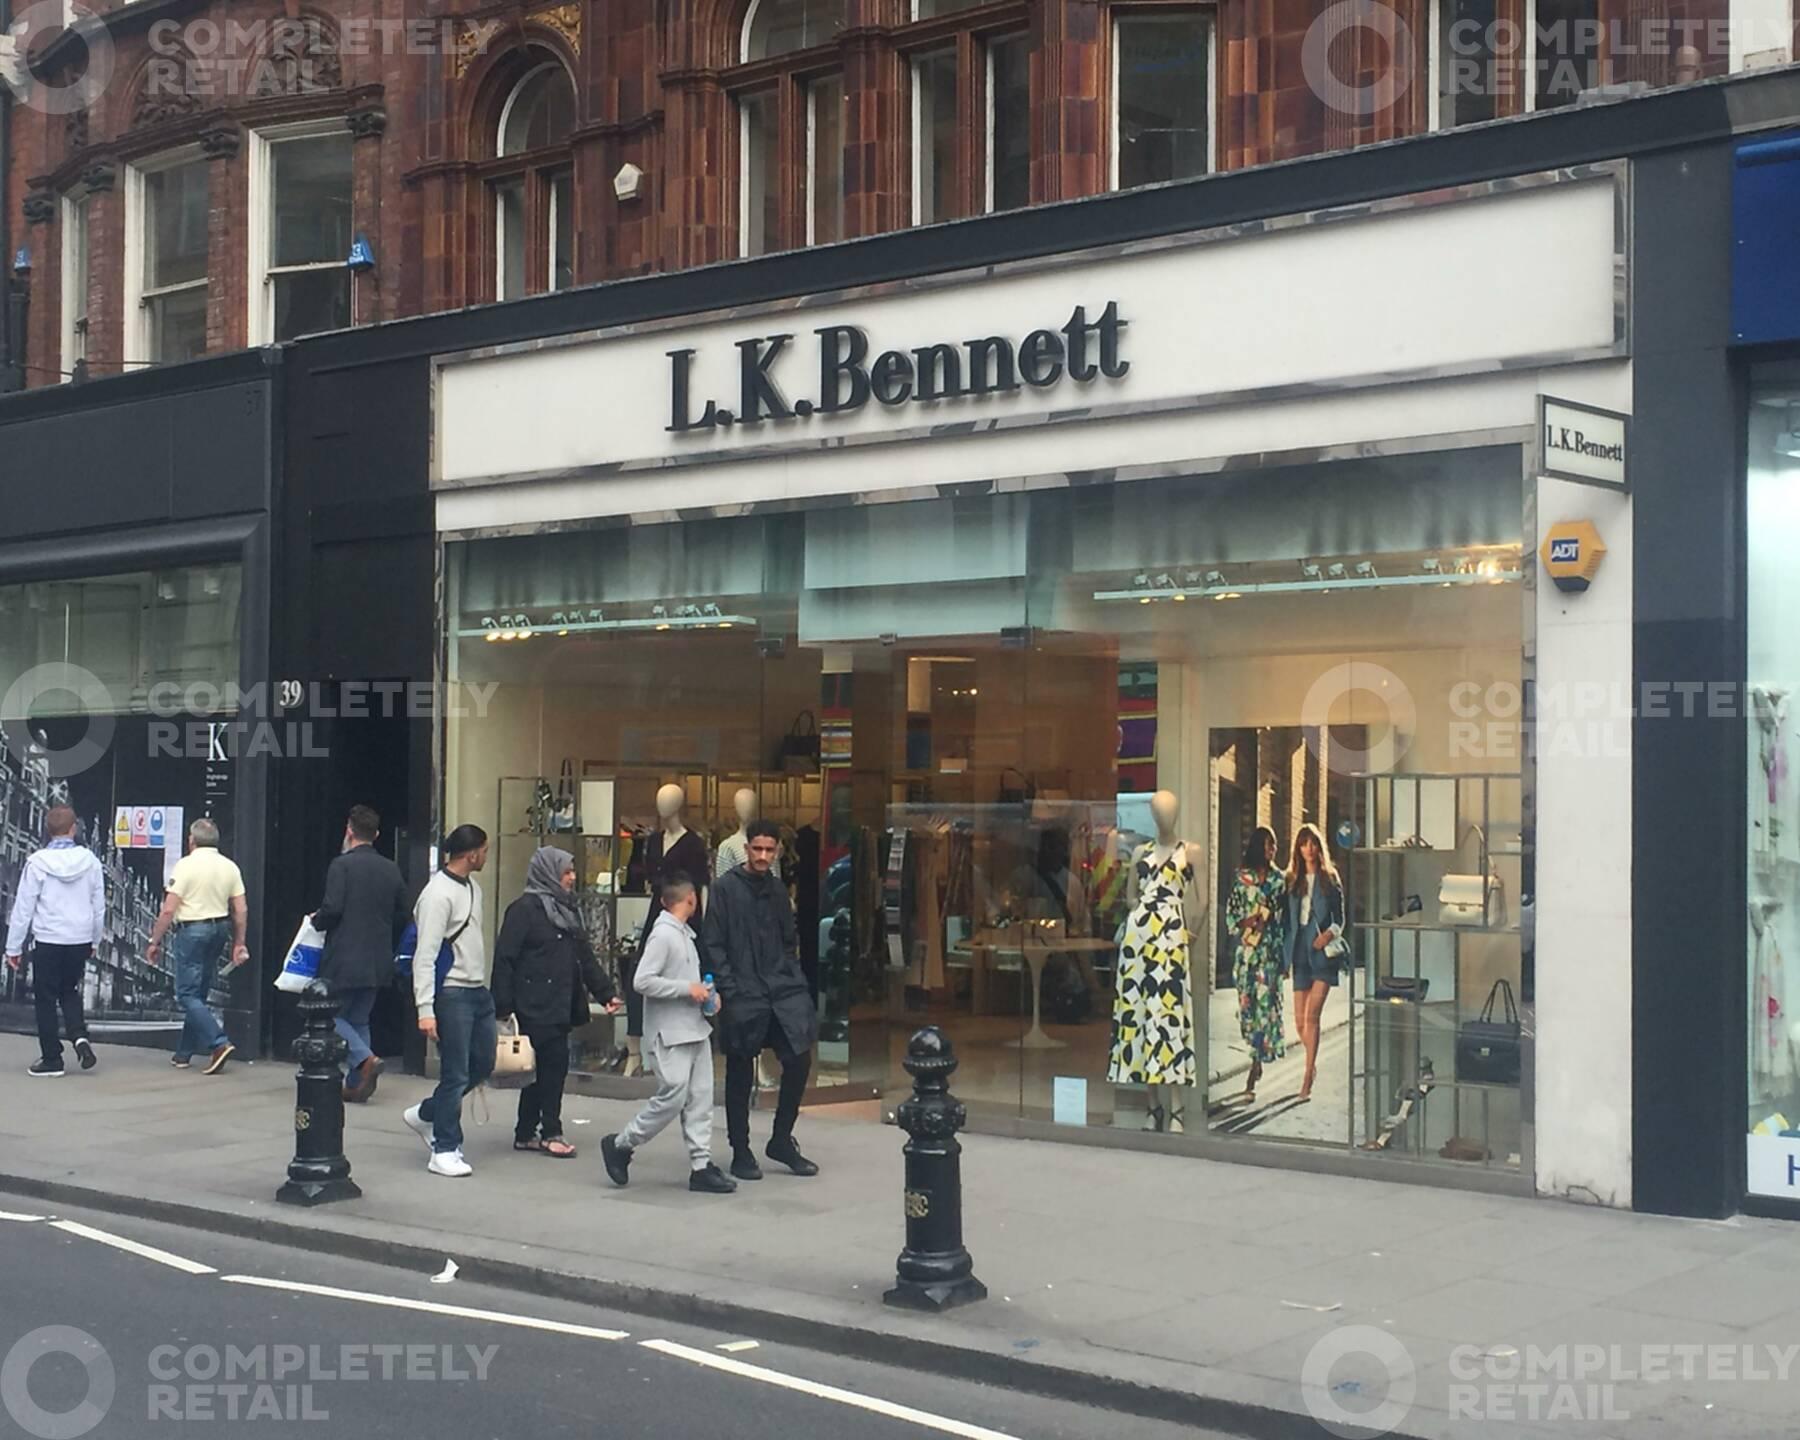 LK Bennett, 39-41 Brompton Road